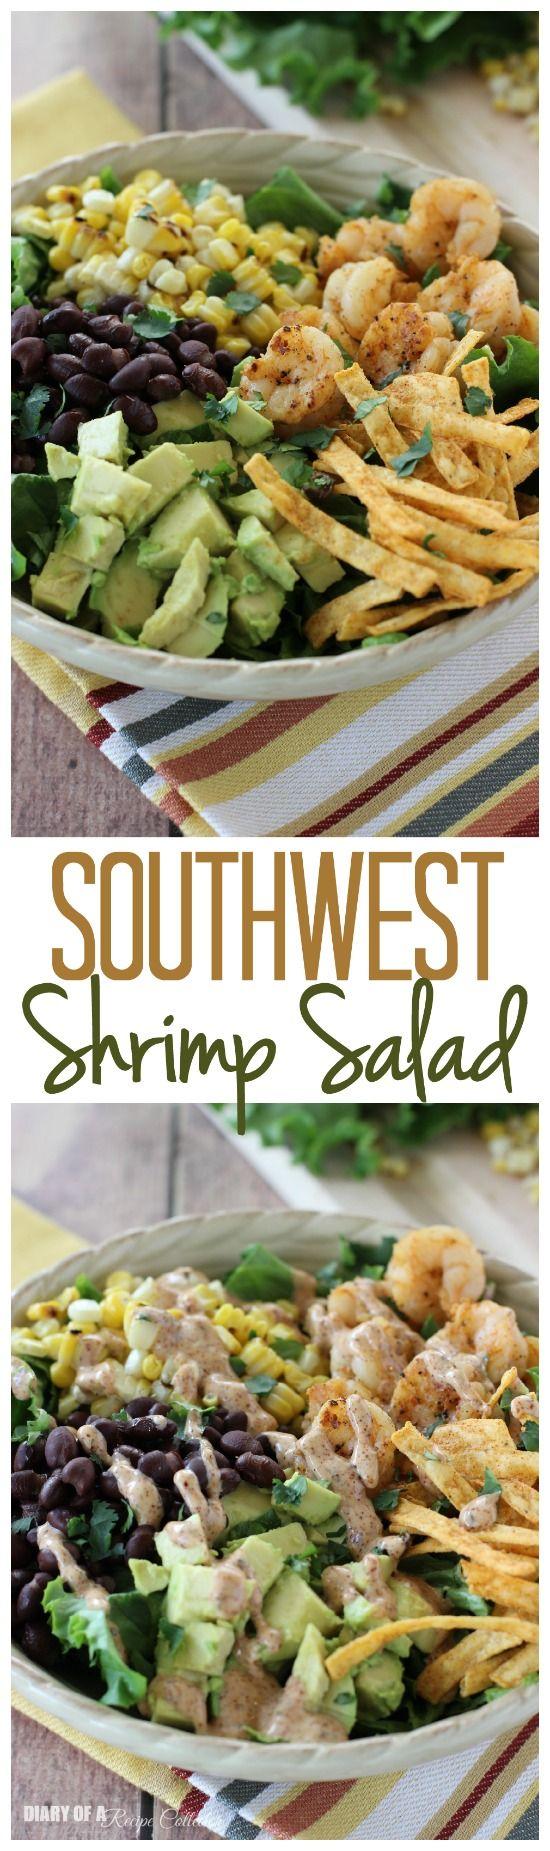 southwest shrimp salad - Ina Garten Shrimp Salad Recipe